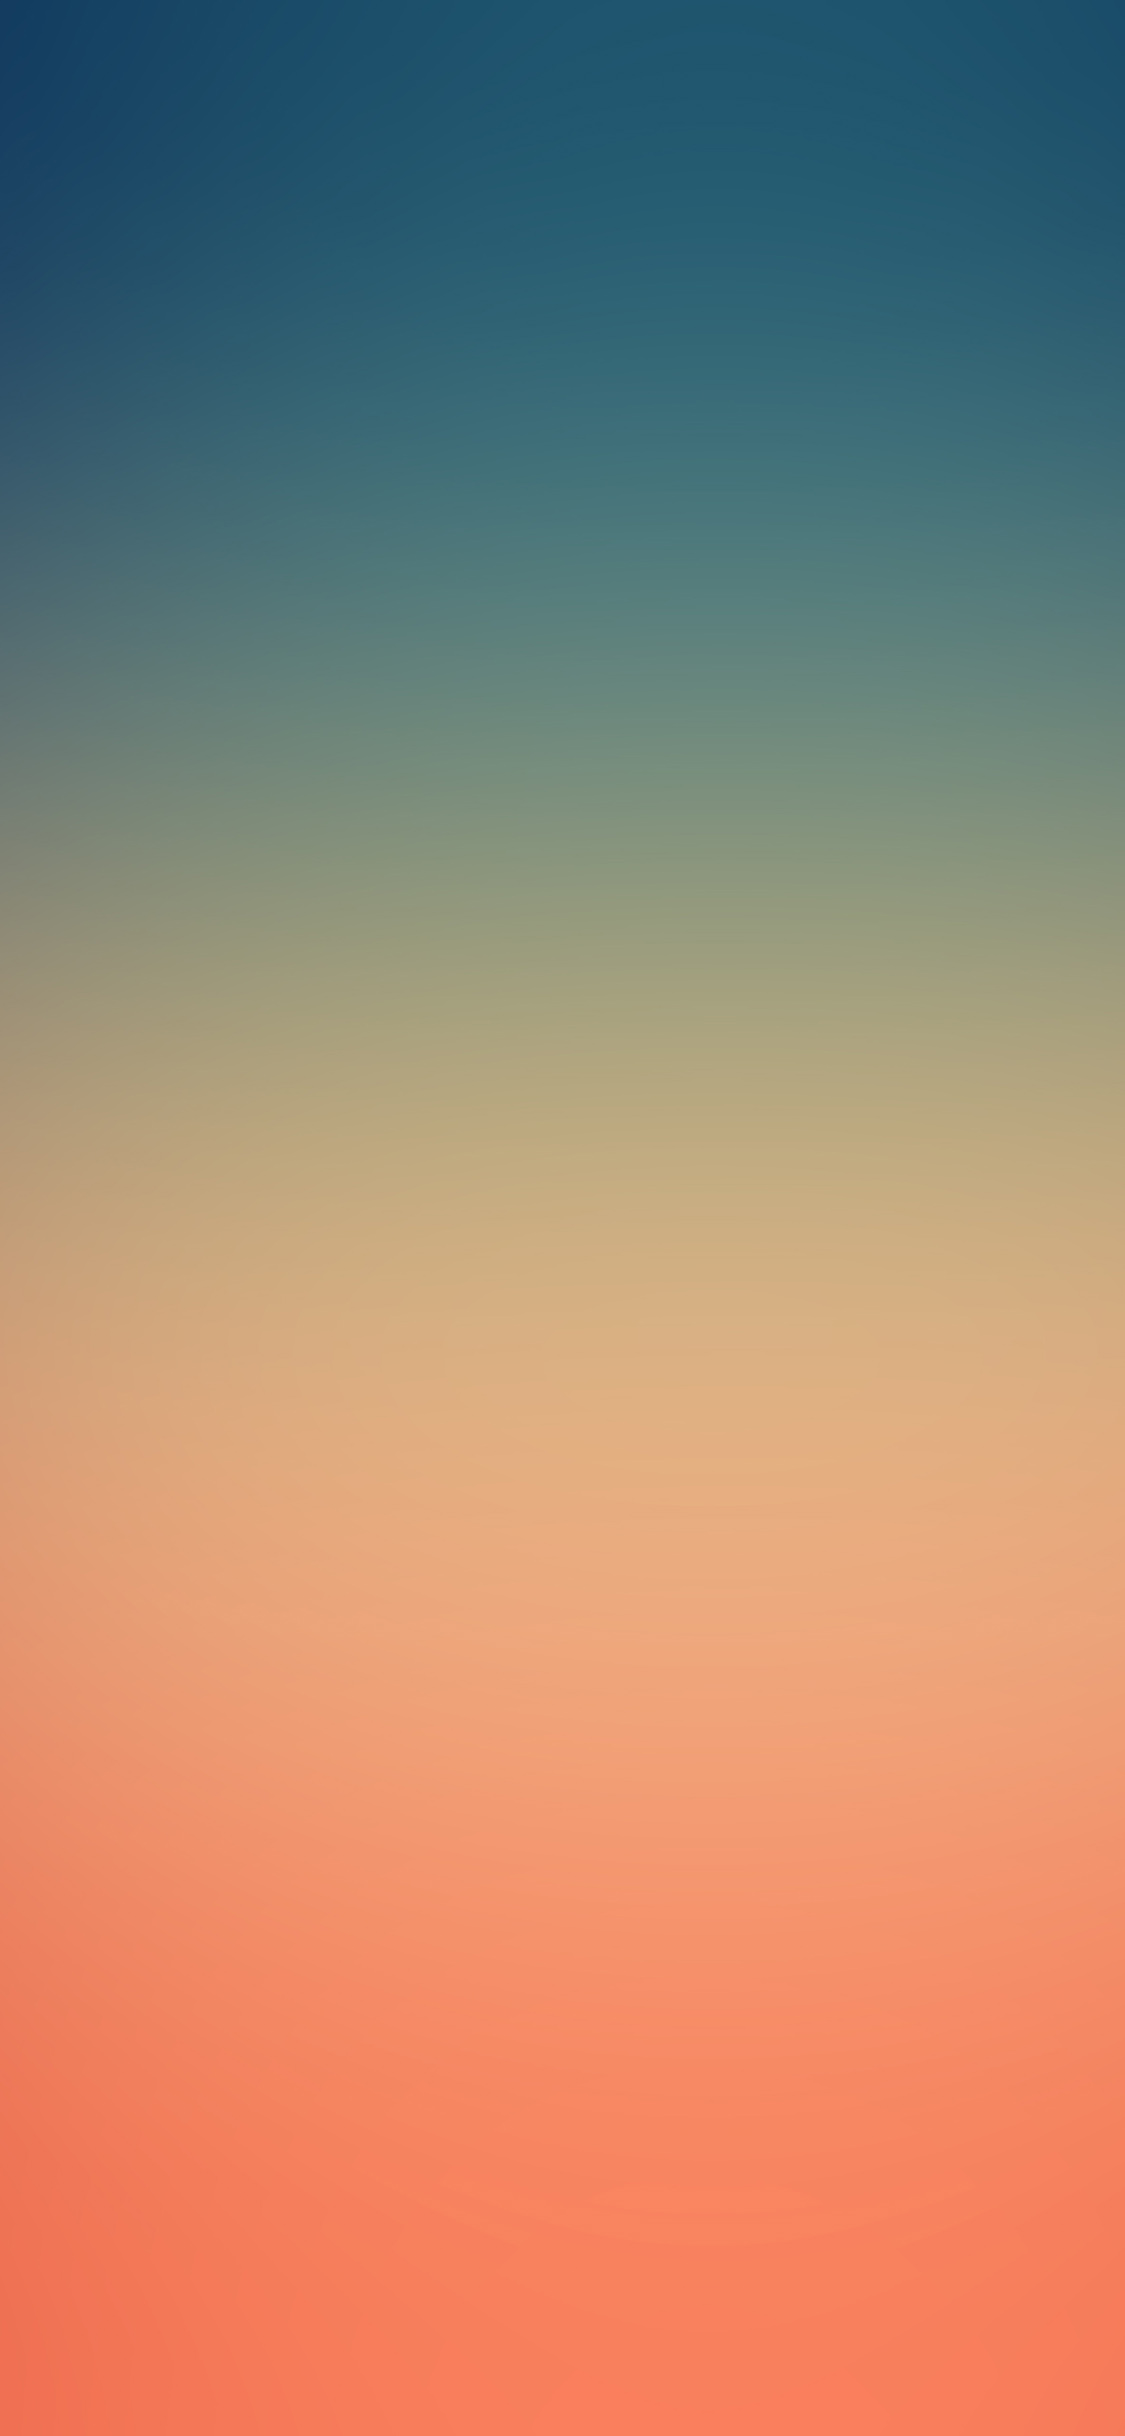 Iphone Cloud Wallpaper Sk83 Blue Orange Night Blur Gradation Wallpaper